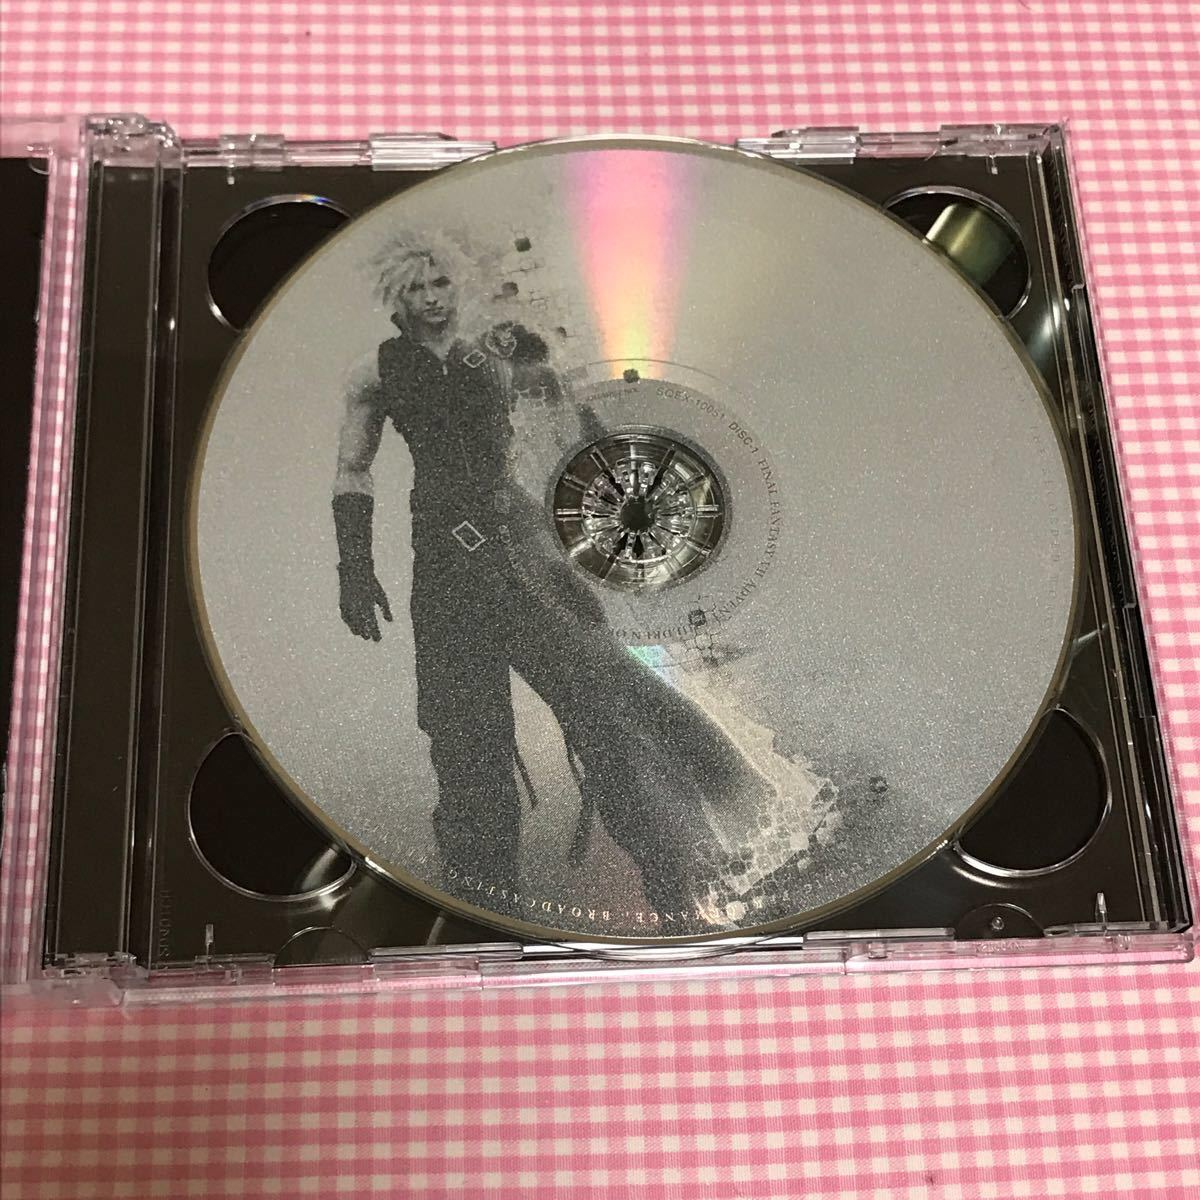 【DVD+CD】ファイナルファンタジーファンタジー7 アドベントチルドレン 初回限定 2点セット